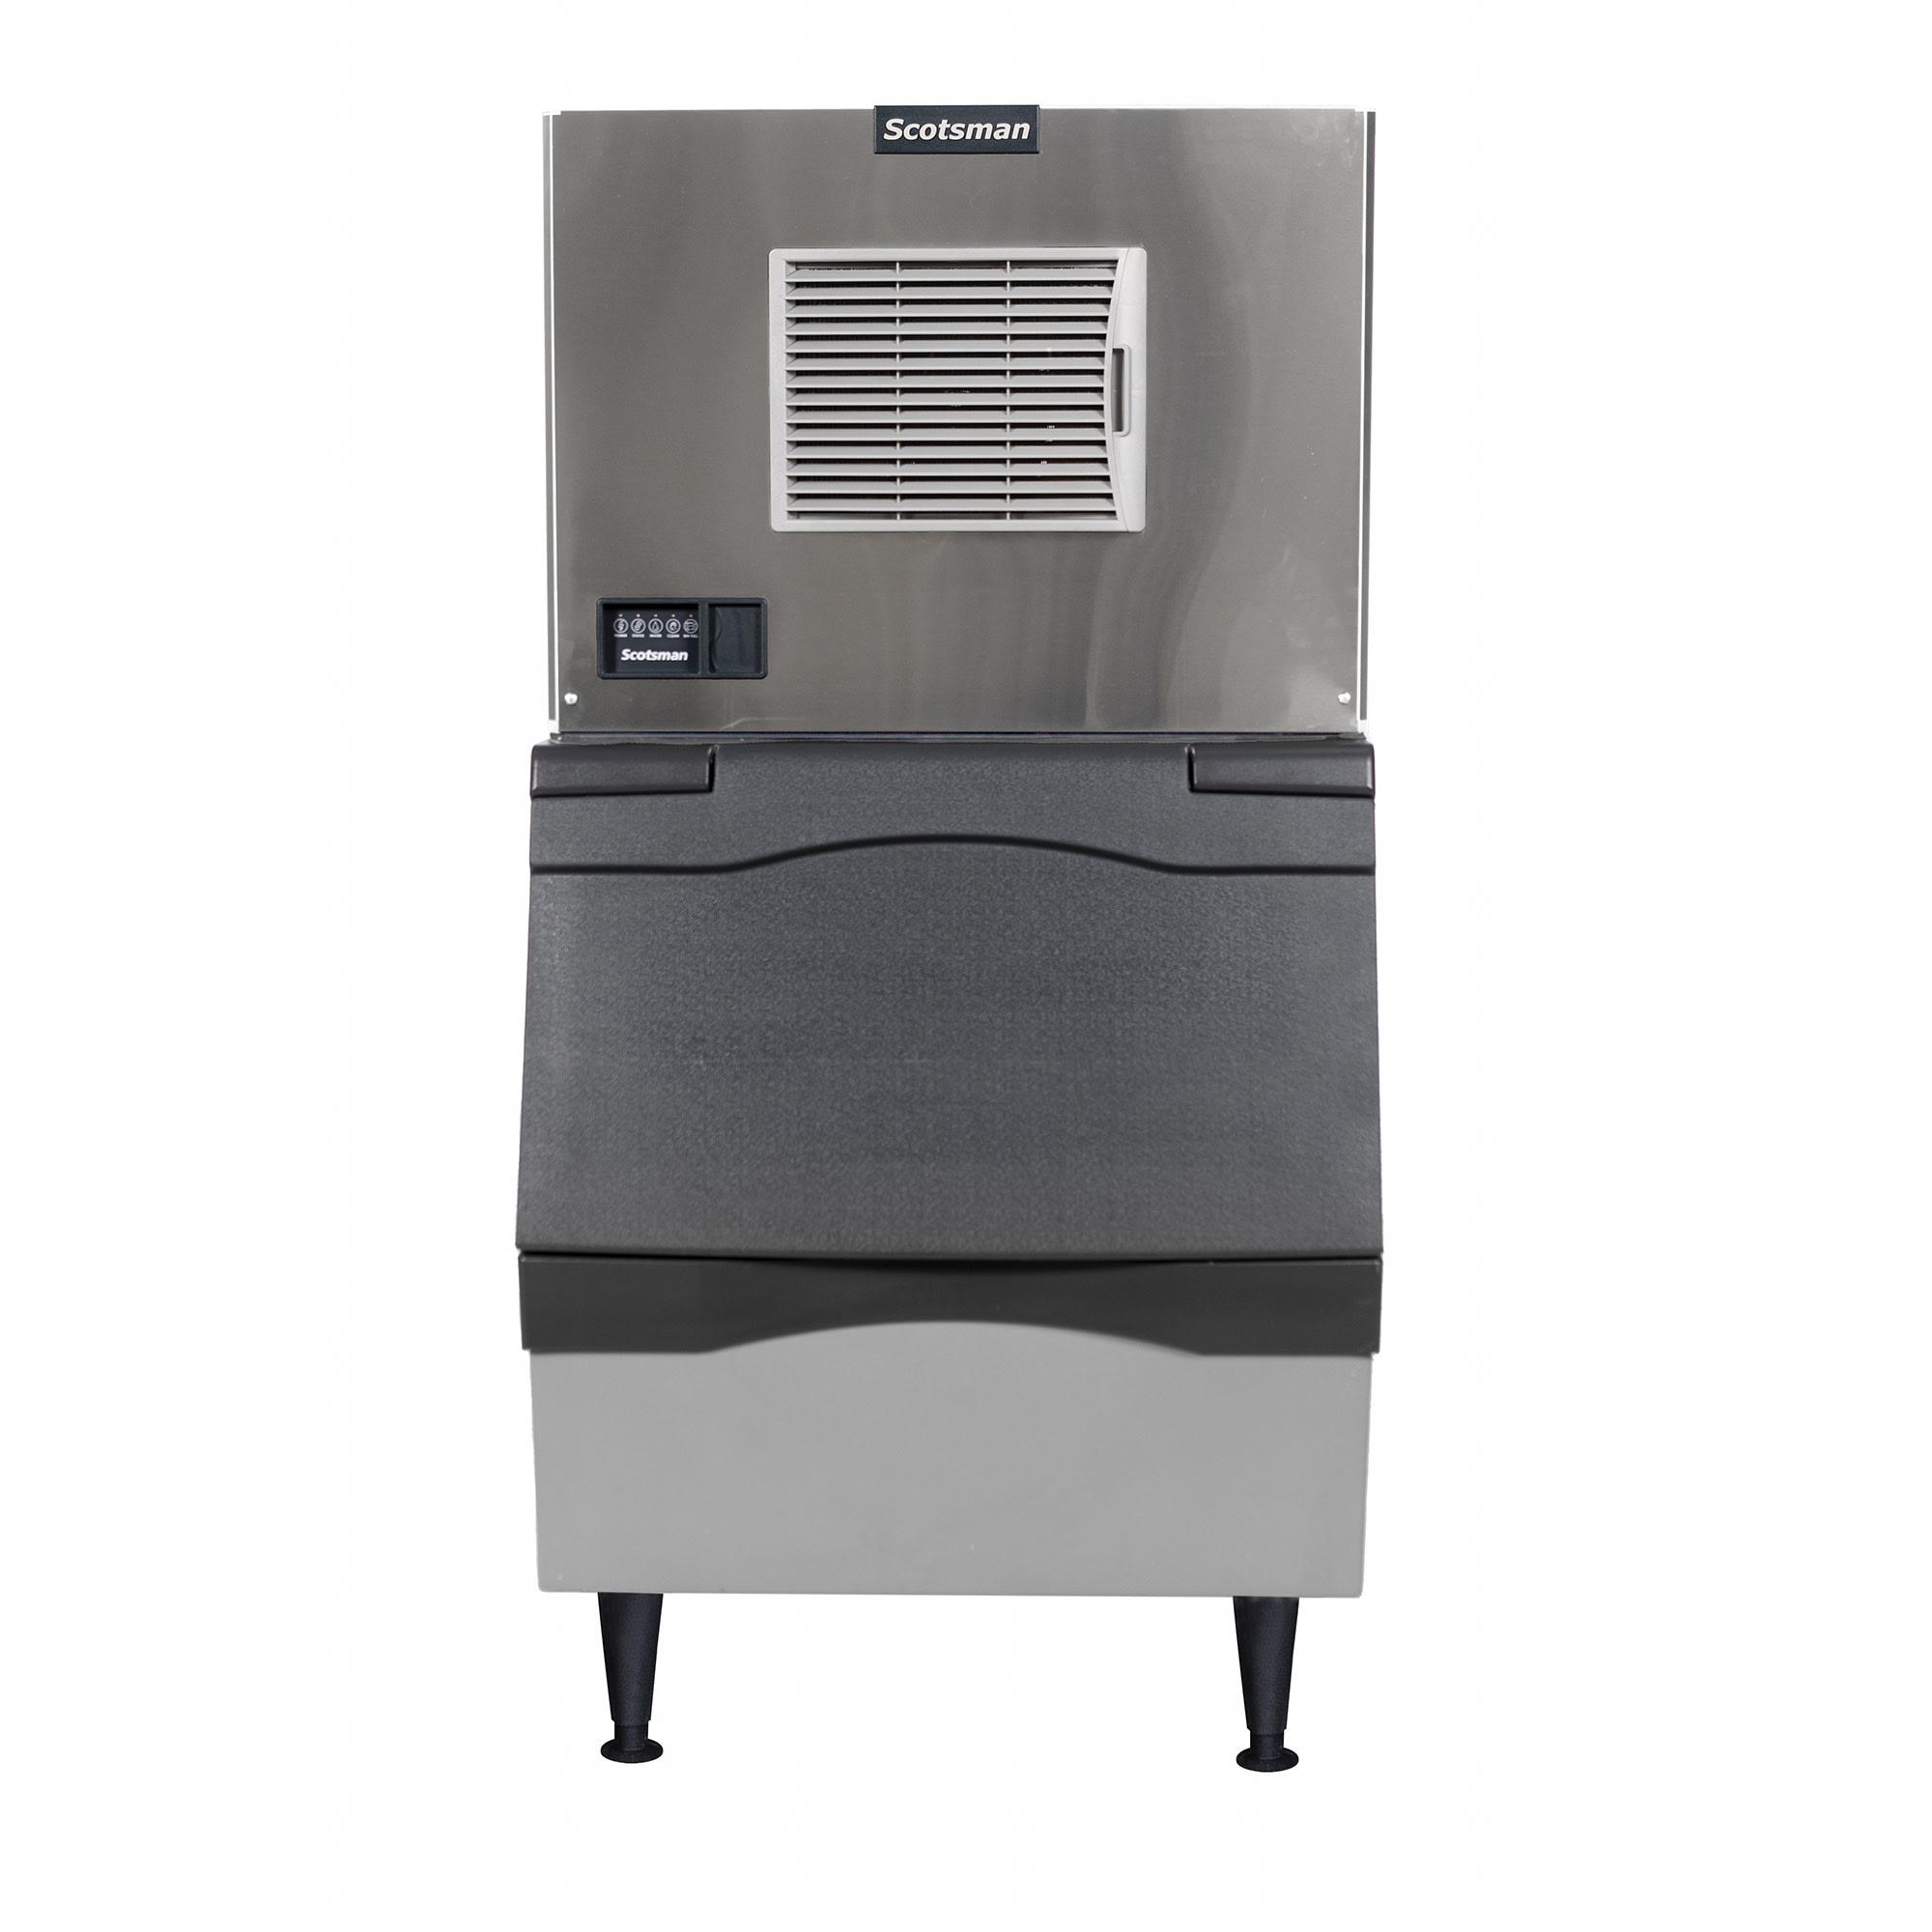 Scotsman C0330SA-1/B330P 350 lb. Prodigy Half Cube Ice Maker with Bin - 344 lb. Storage, Air Cooled, 115v